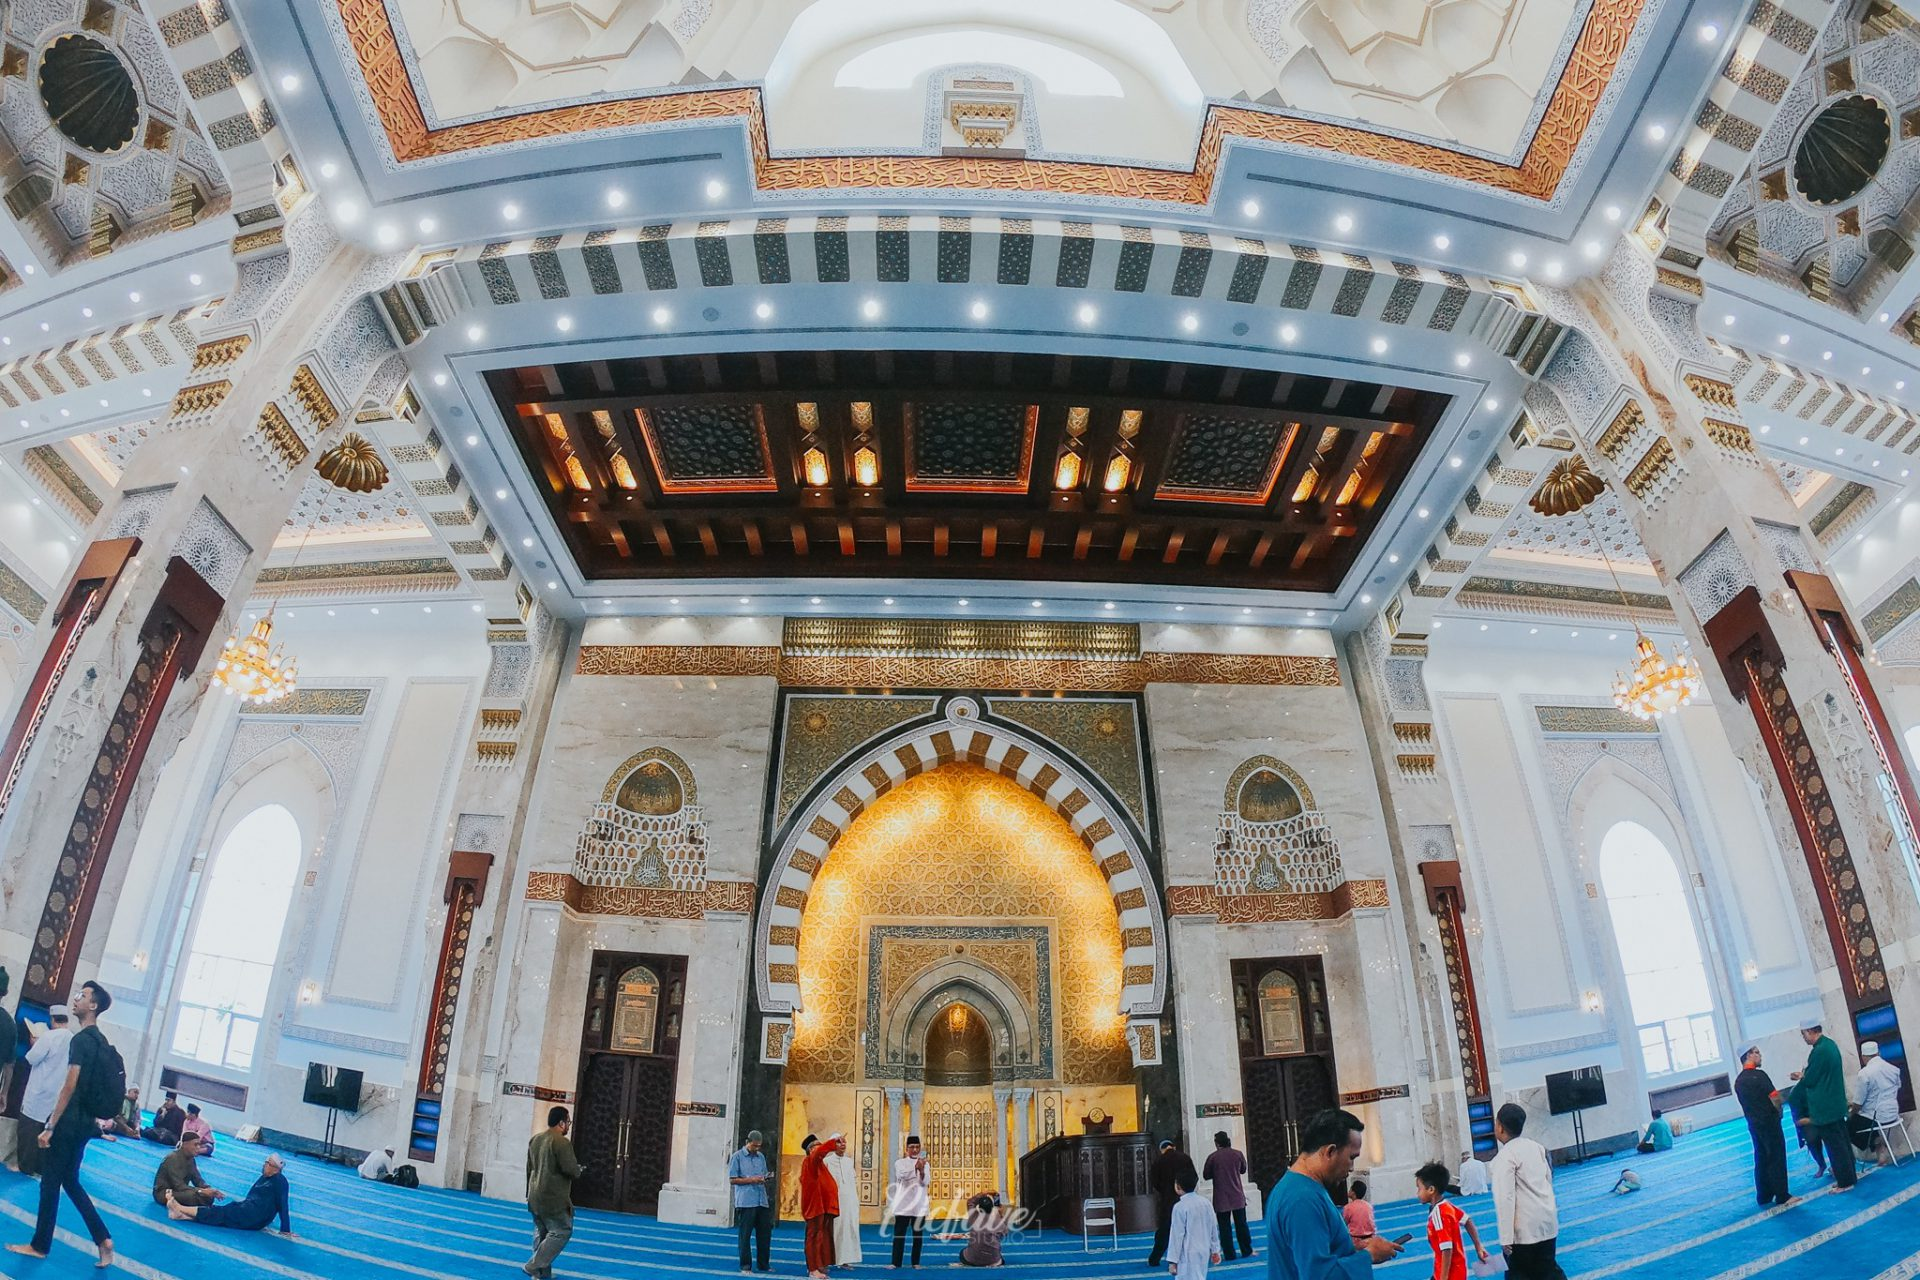 71700778 10221370435909221 6498742902800252928 o 27 42 573380 - Seni Bina Indah Masjid Sri Sendayan Jadi Tumpuan